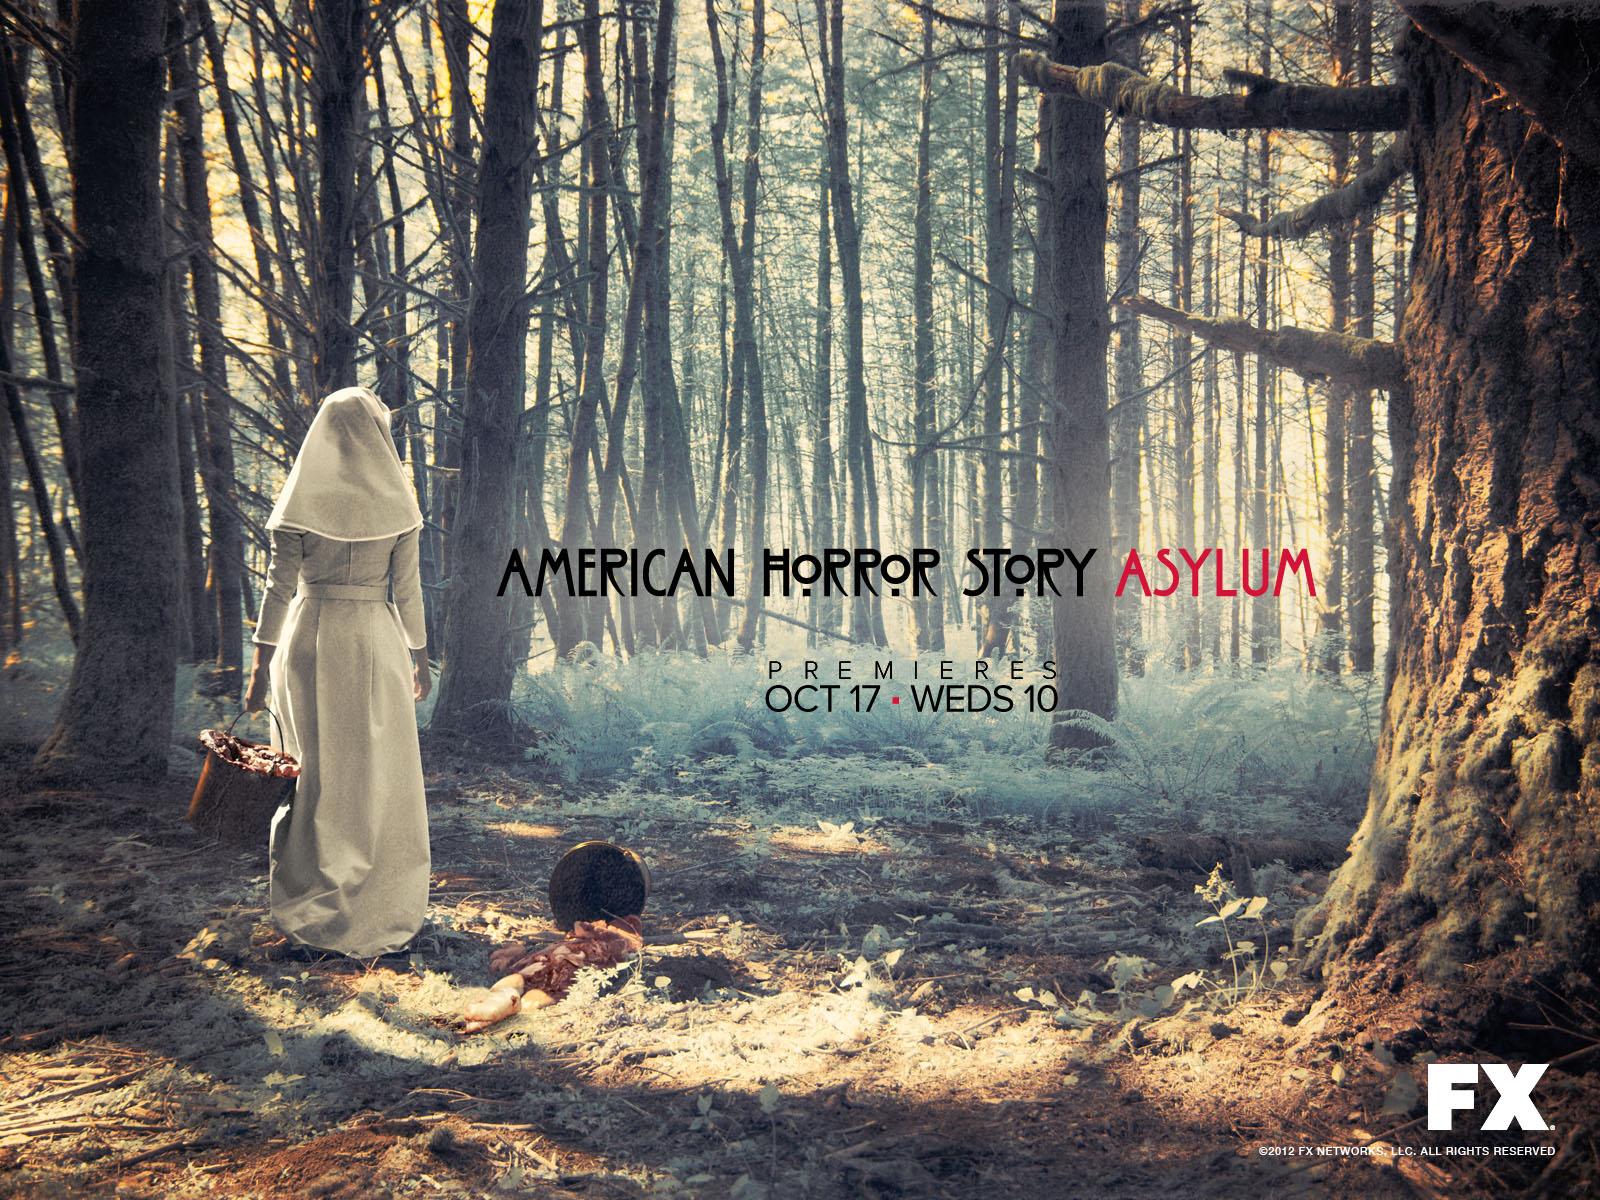 Inside The Asylum Costume Design Of American Horror Story Asylum The Eye Of Faith Vintage 11 11 11